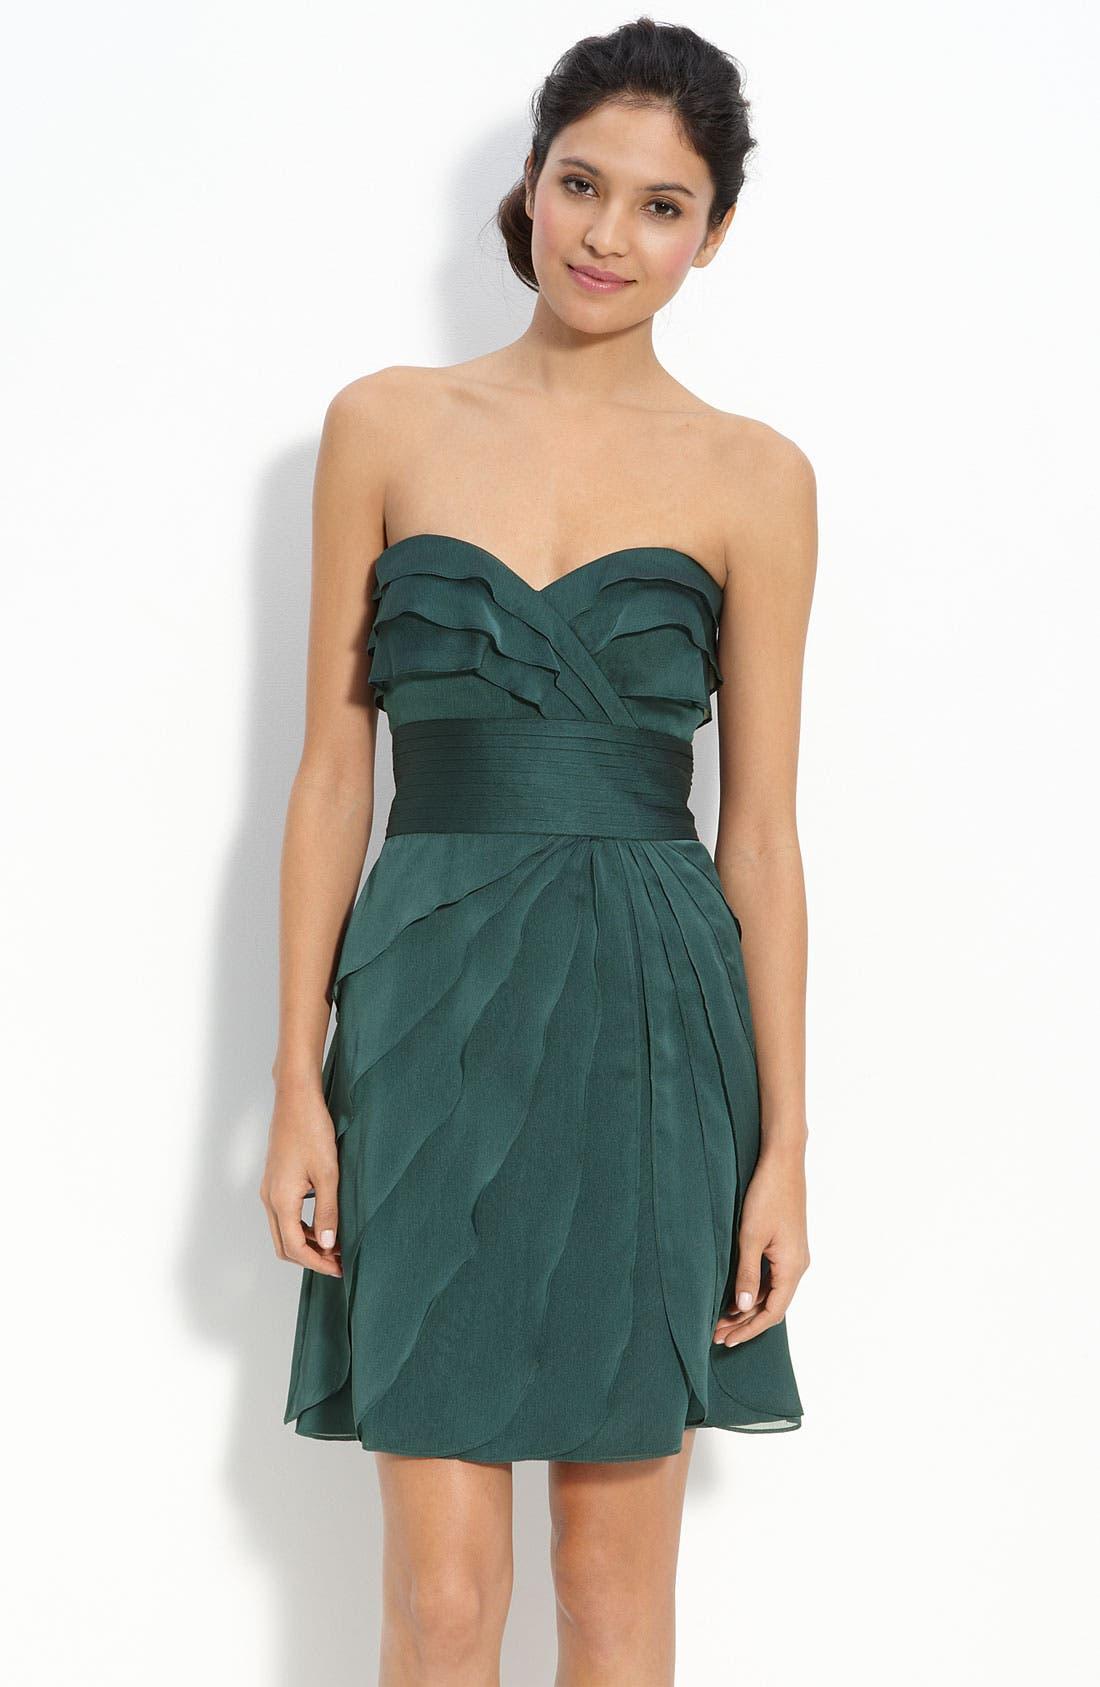 Main Image - Adrianna Papell Tiered Iridescent Chiffon Dress